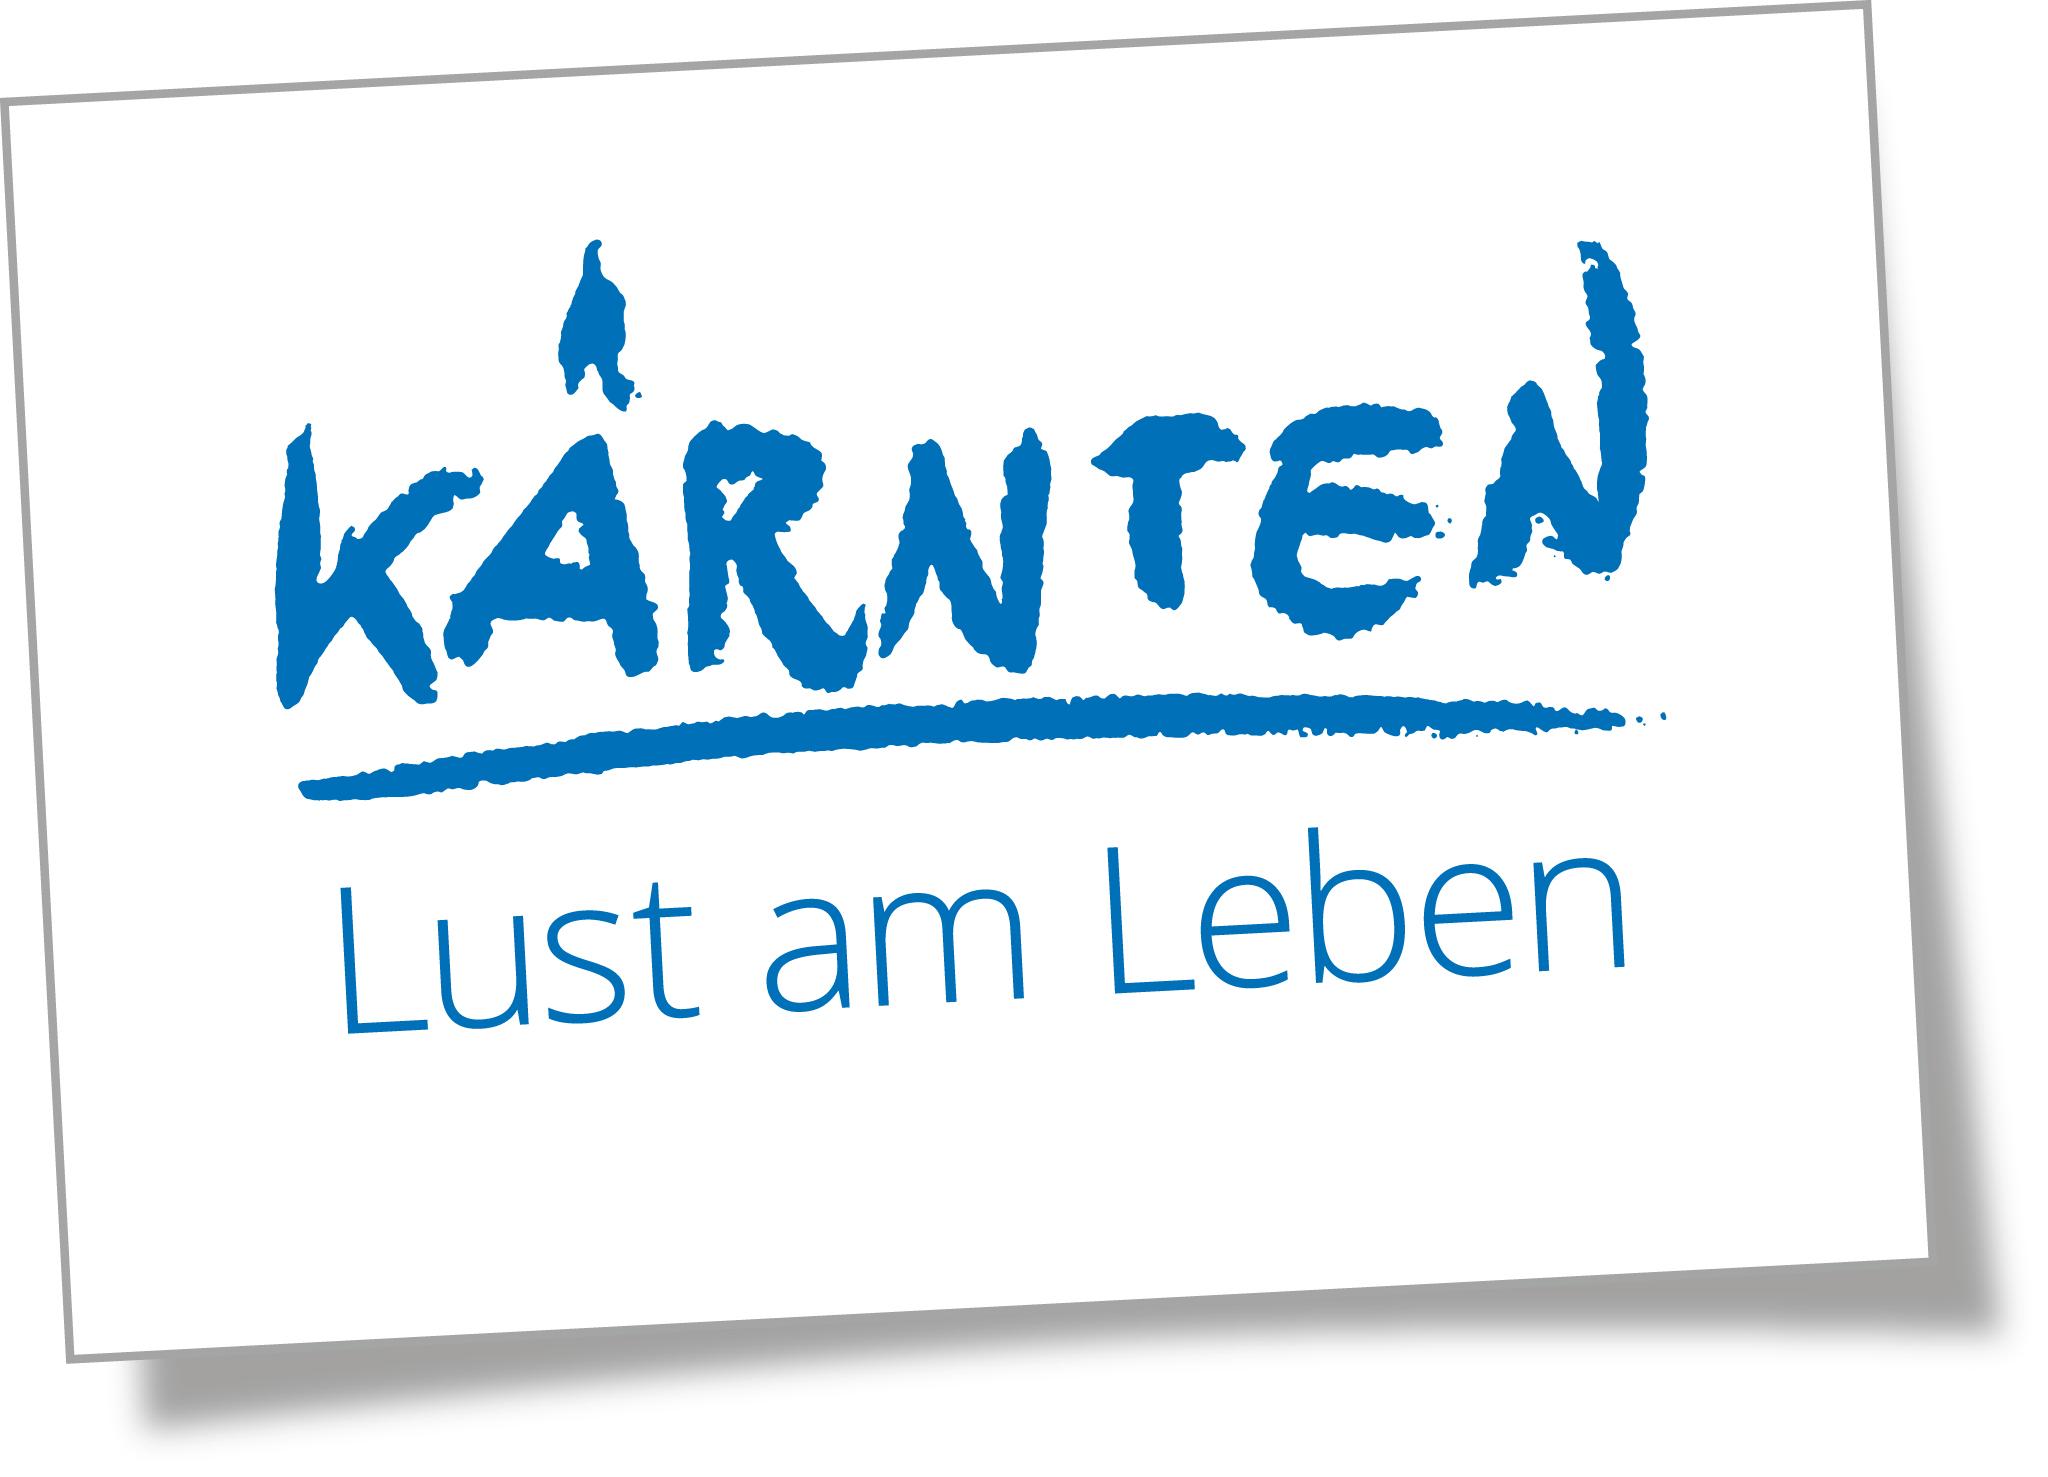 Logo Kärnten - LUST am Leben